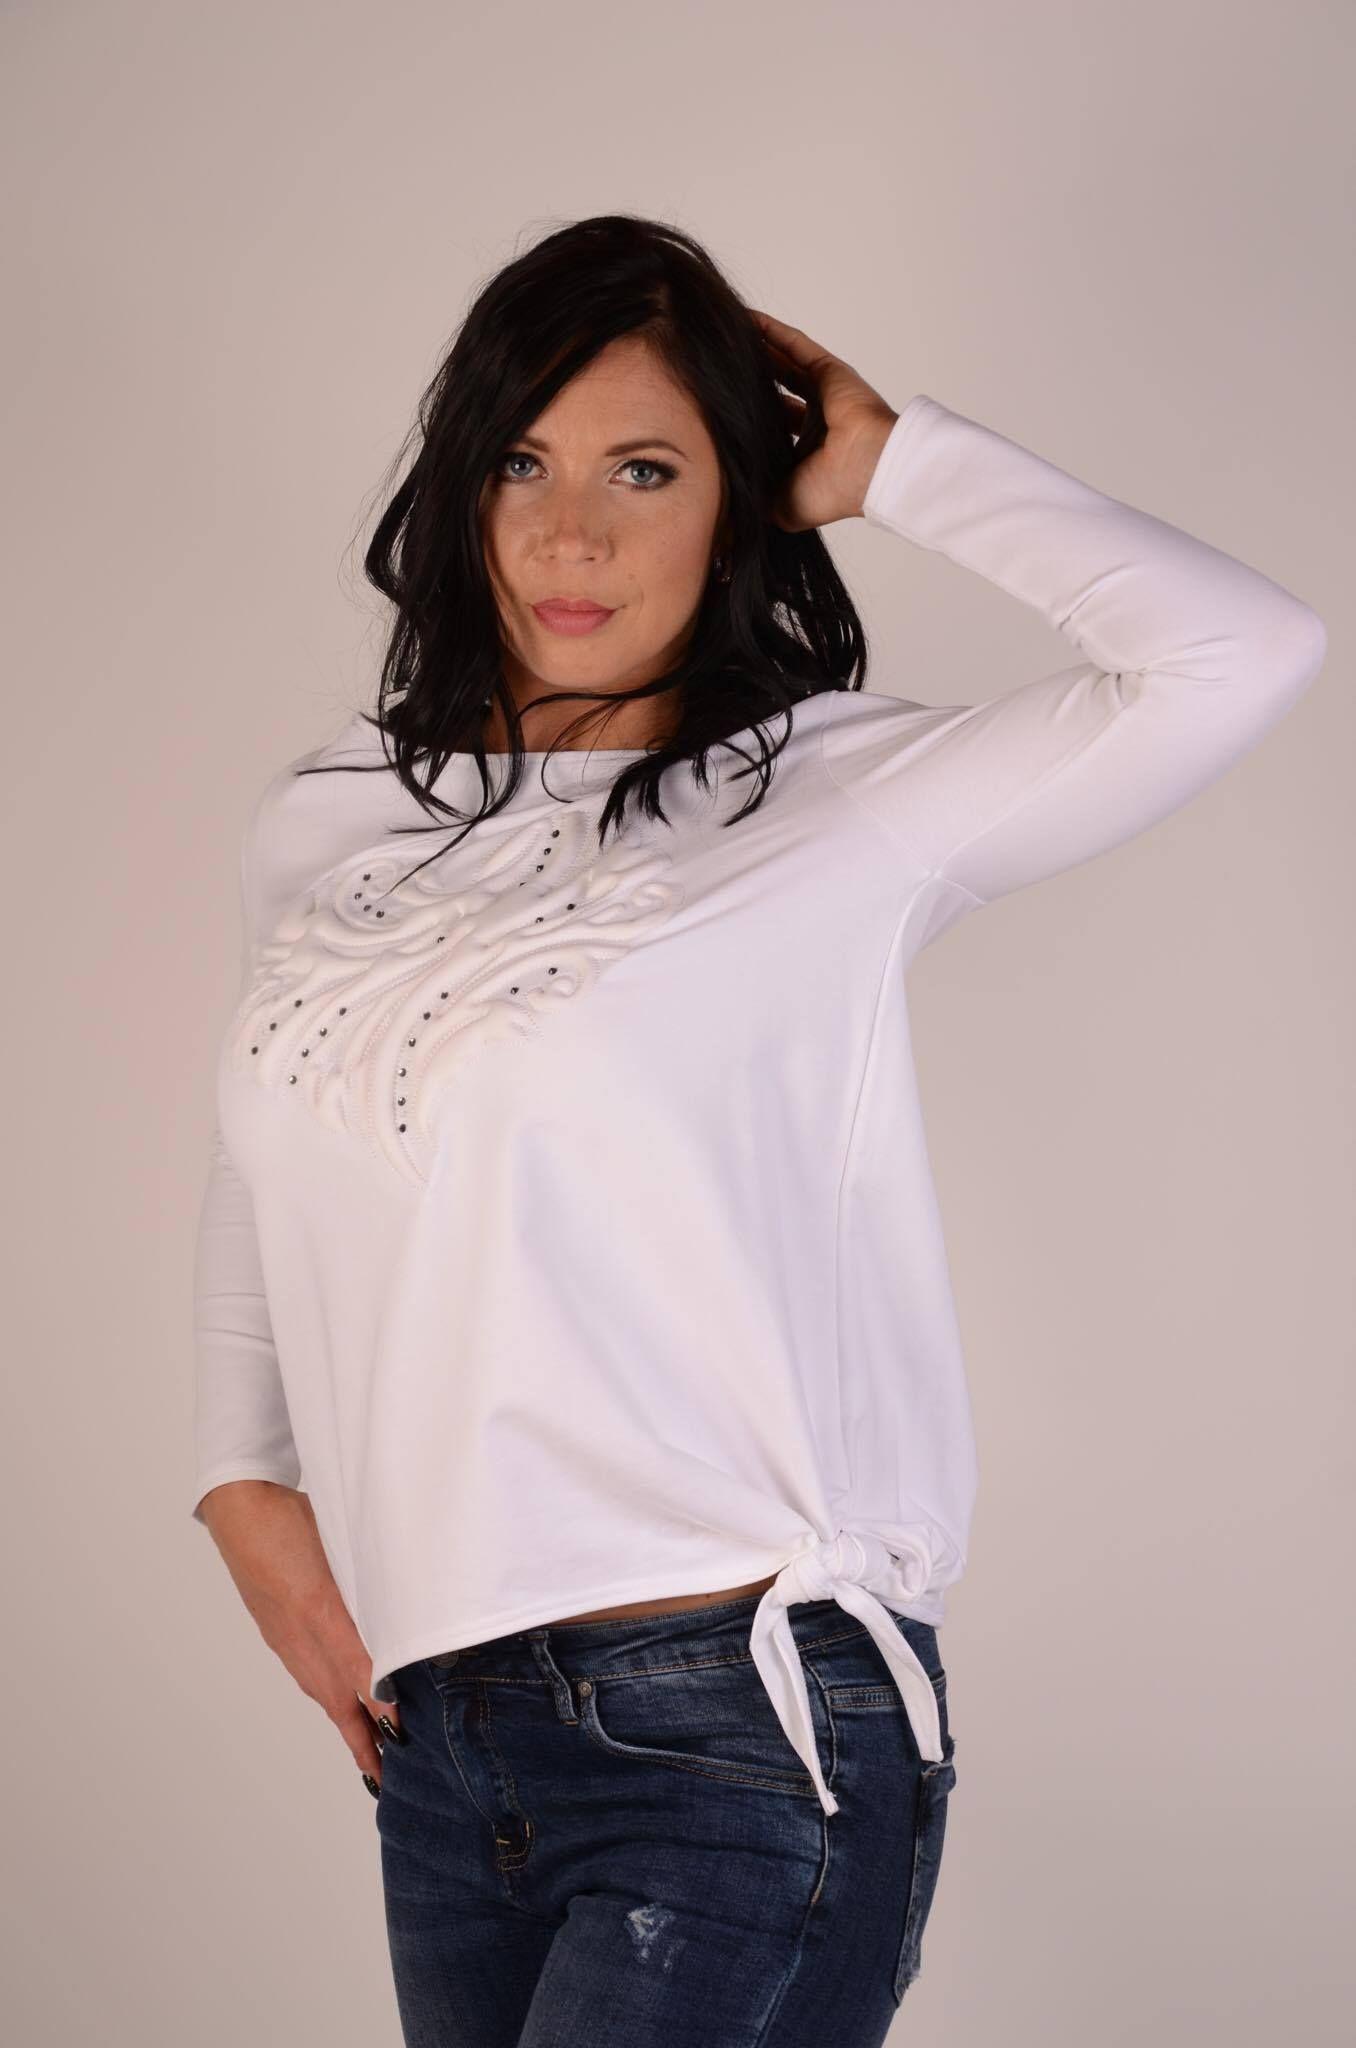 Long sleeve white shirt ladies tops fashion white long